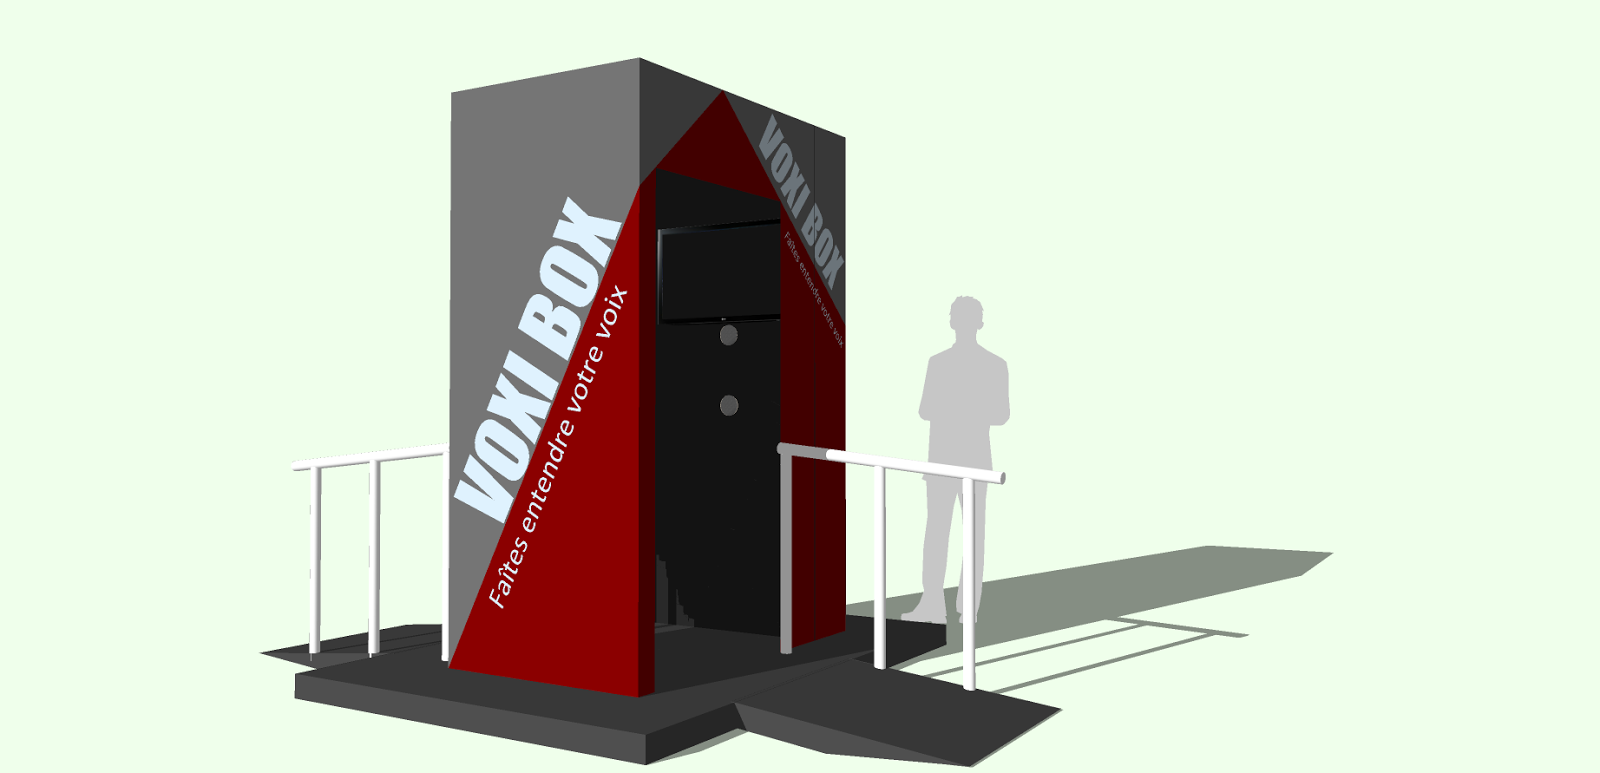 Juko access bureau de conception voxi box for Bureau de conception